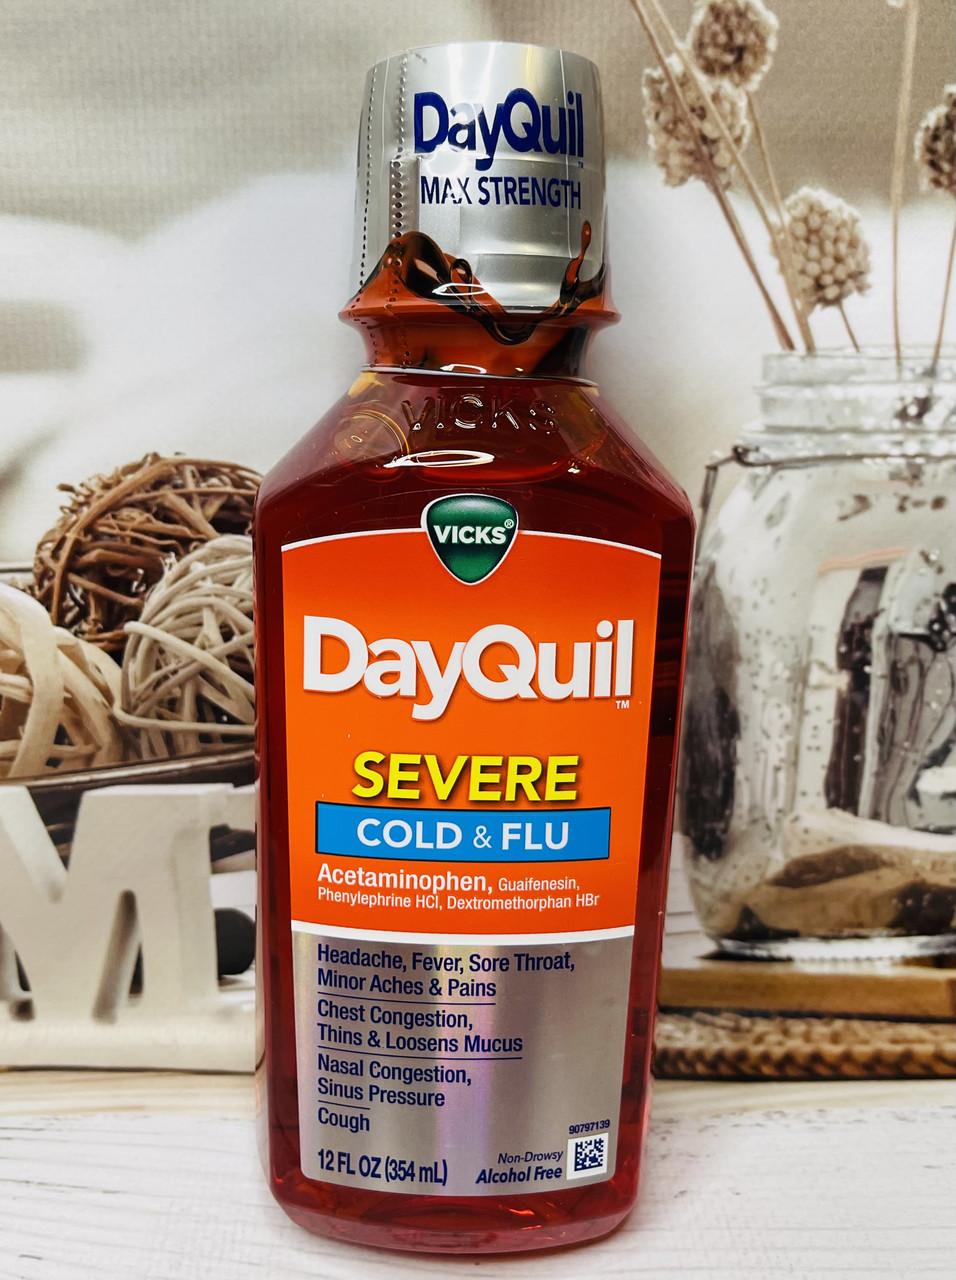 Средство от простуды, кашля VICKS DayQuil на день